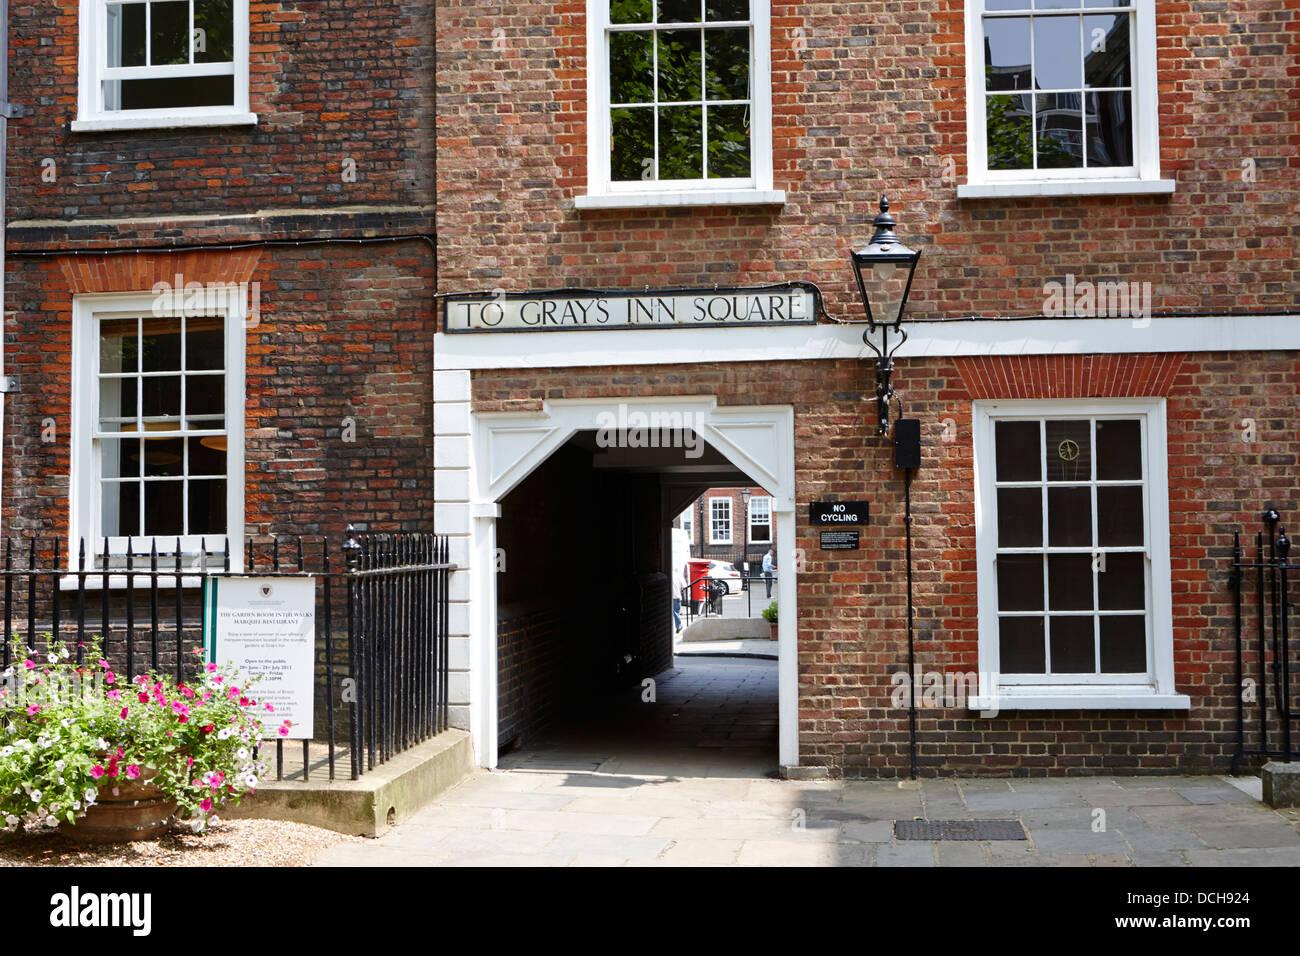 old entrance to grays inn square London England UK - Stock Image